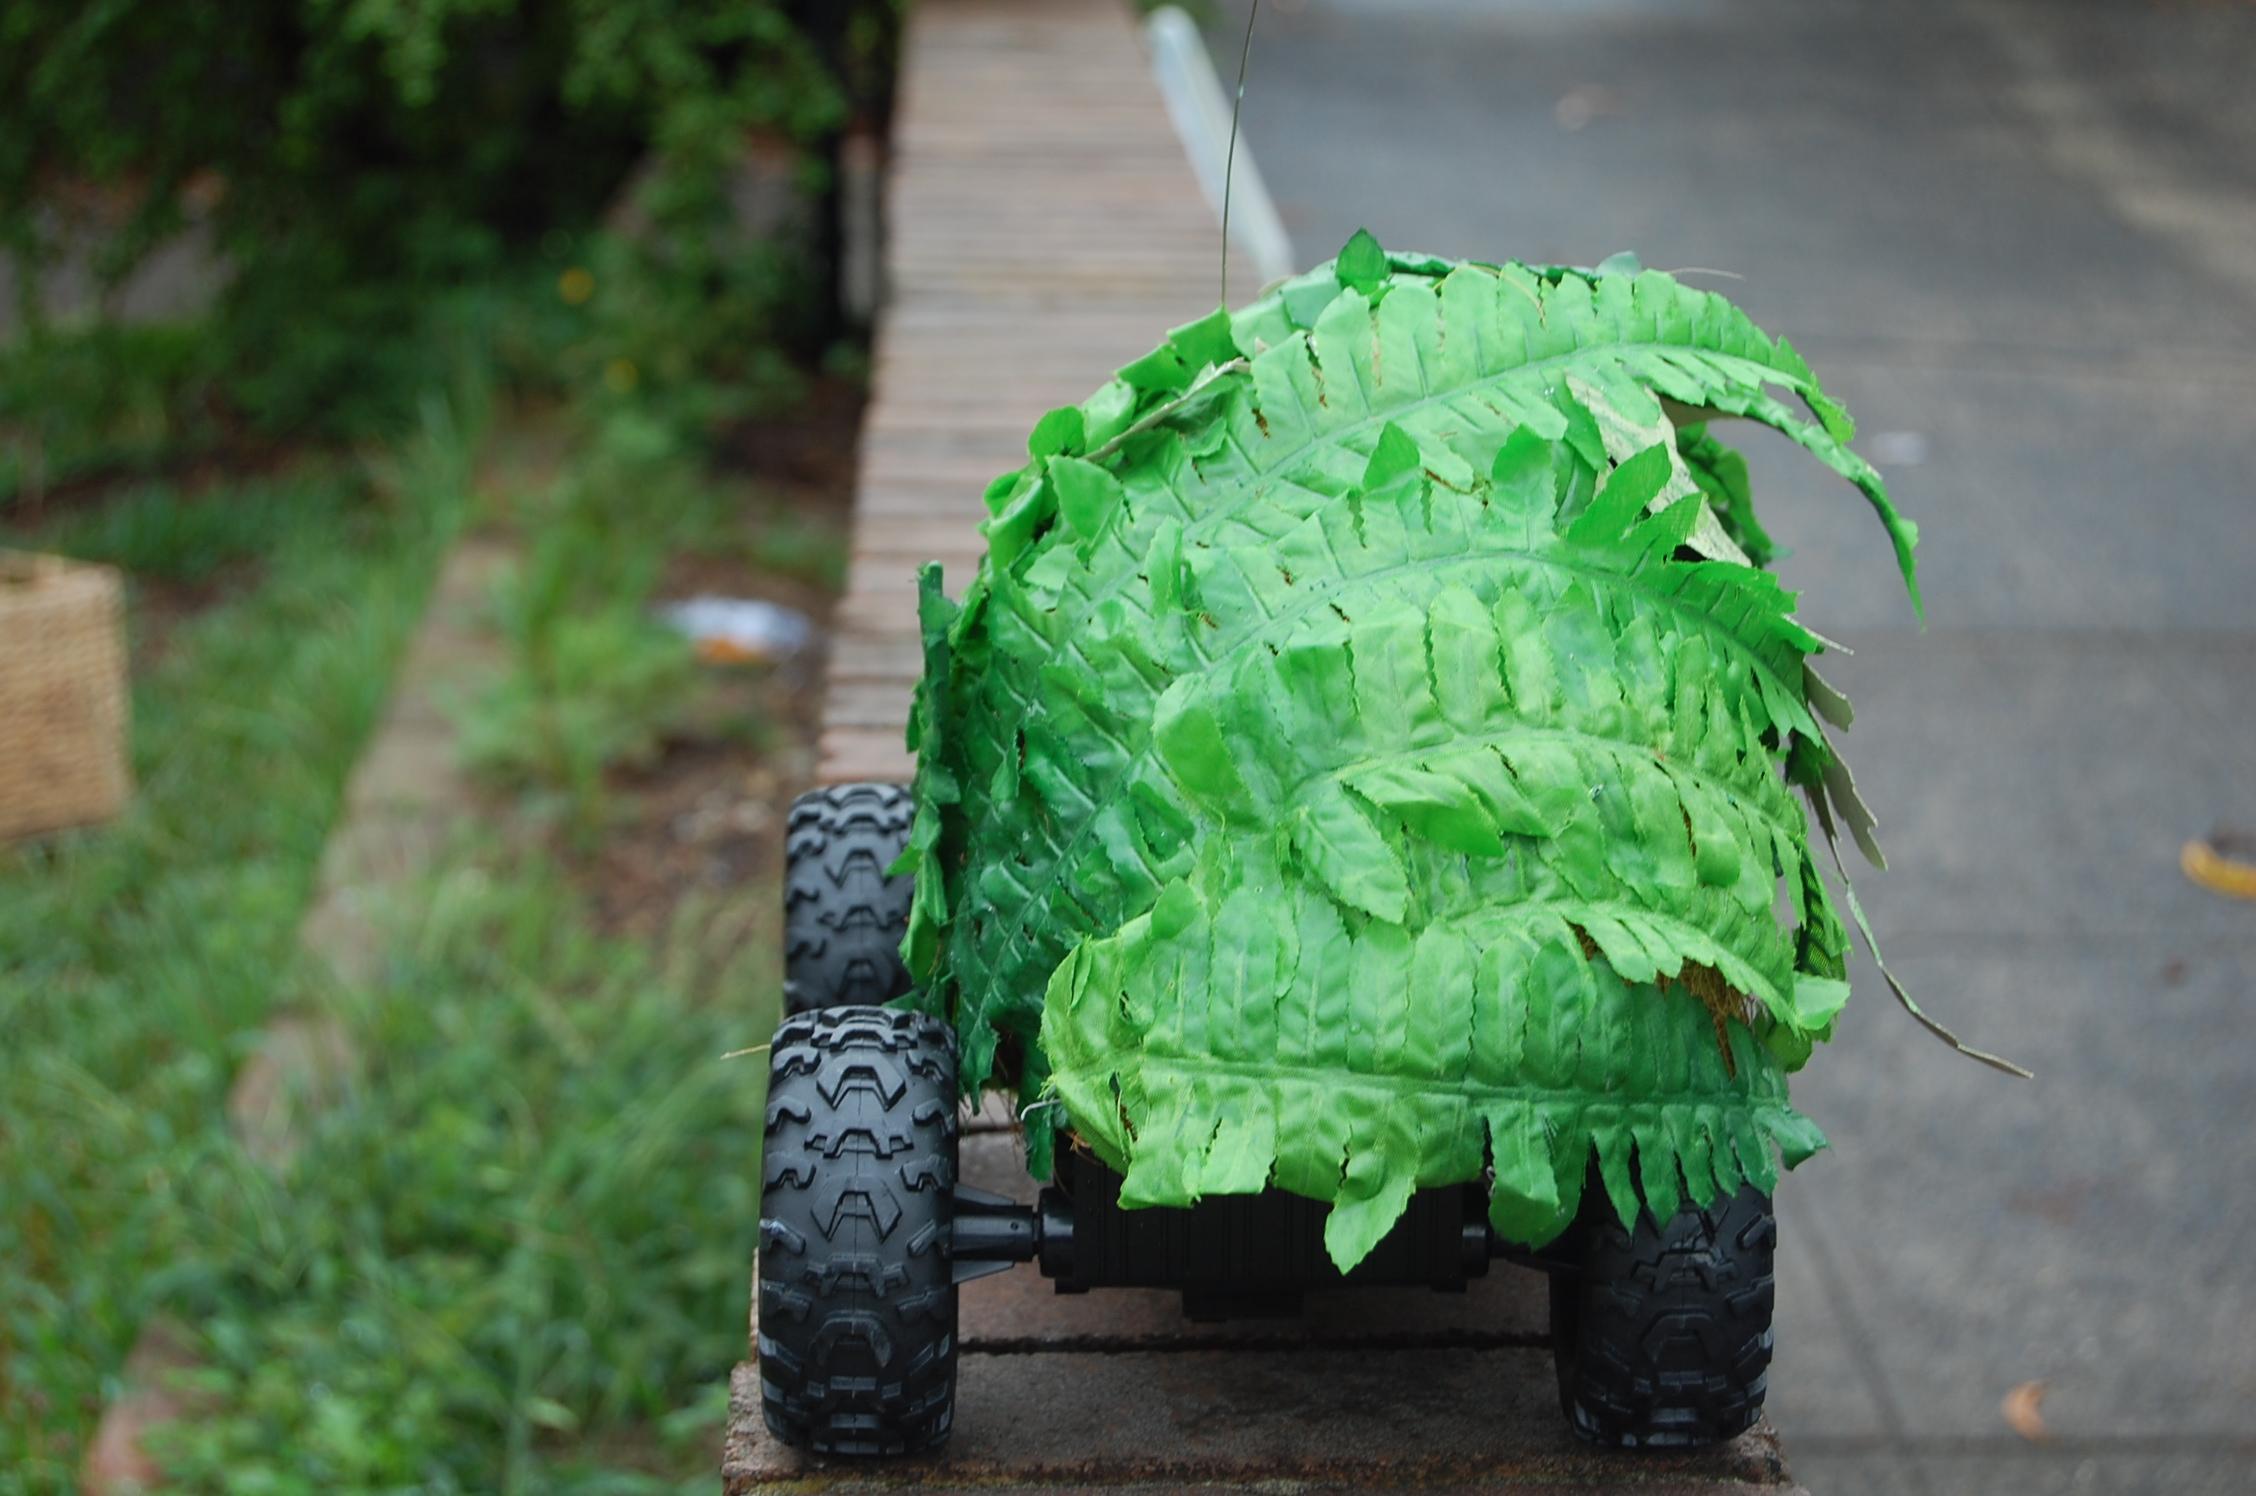 Remote Control Garden (detail)30cmx 25cm, plastic foliage, paper, toy RC vehicl